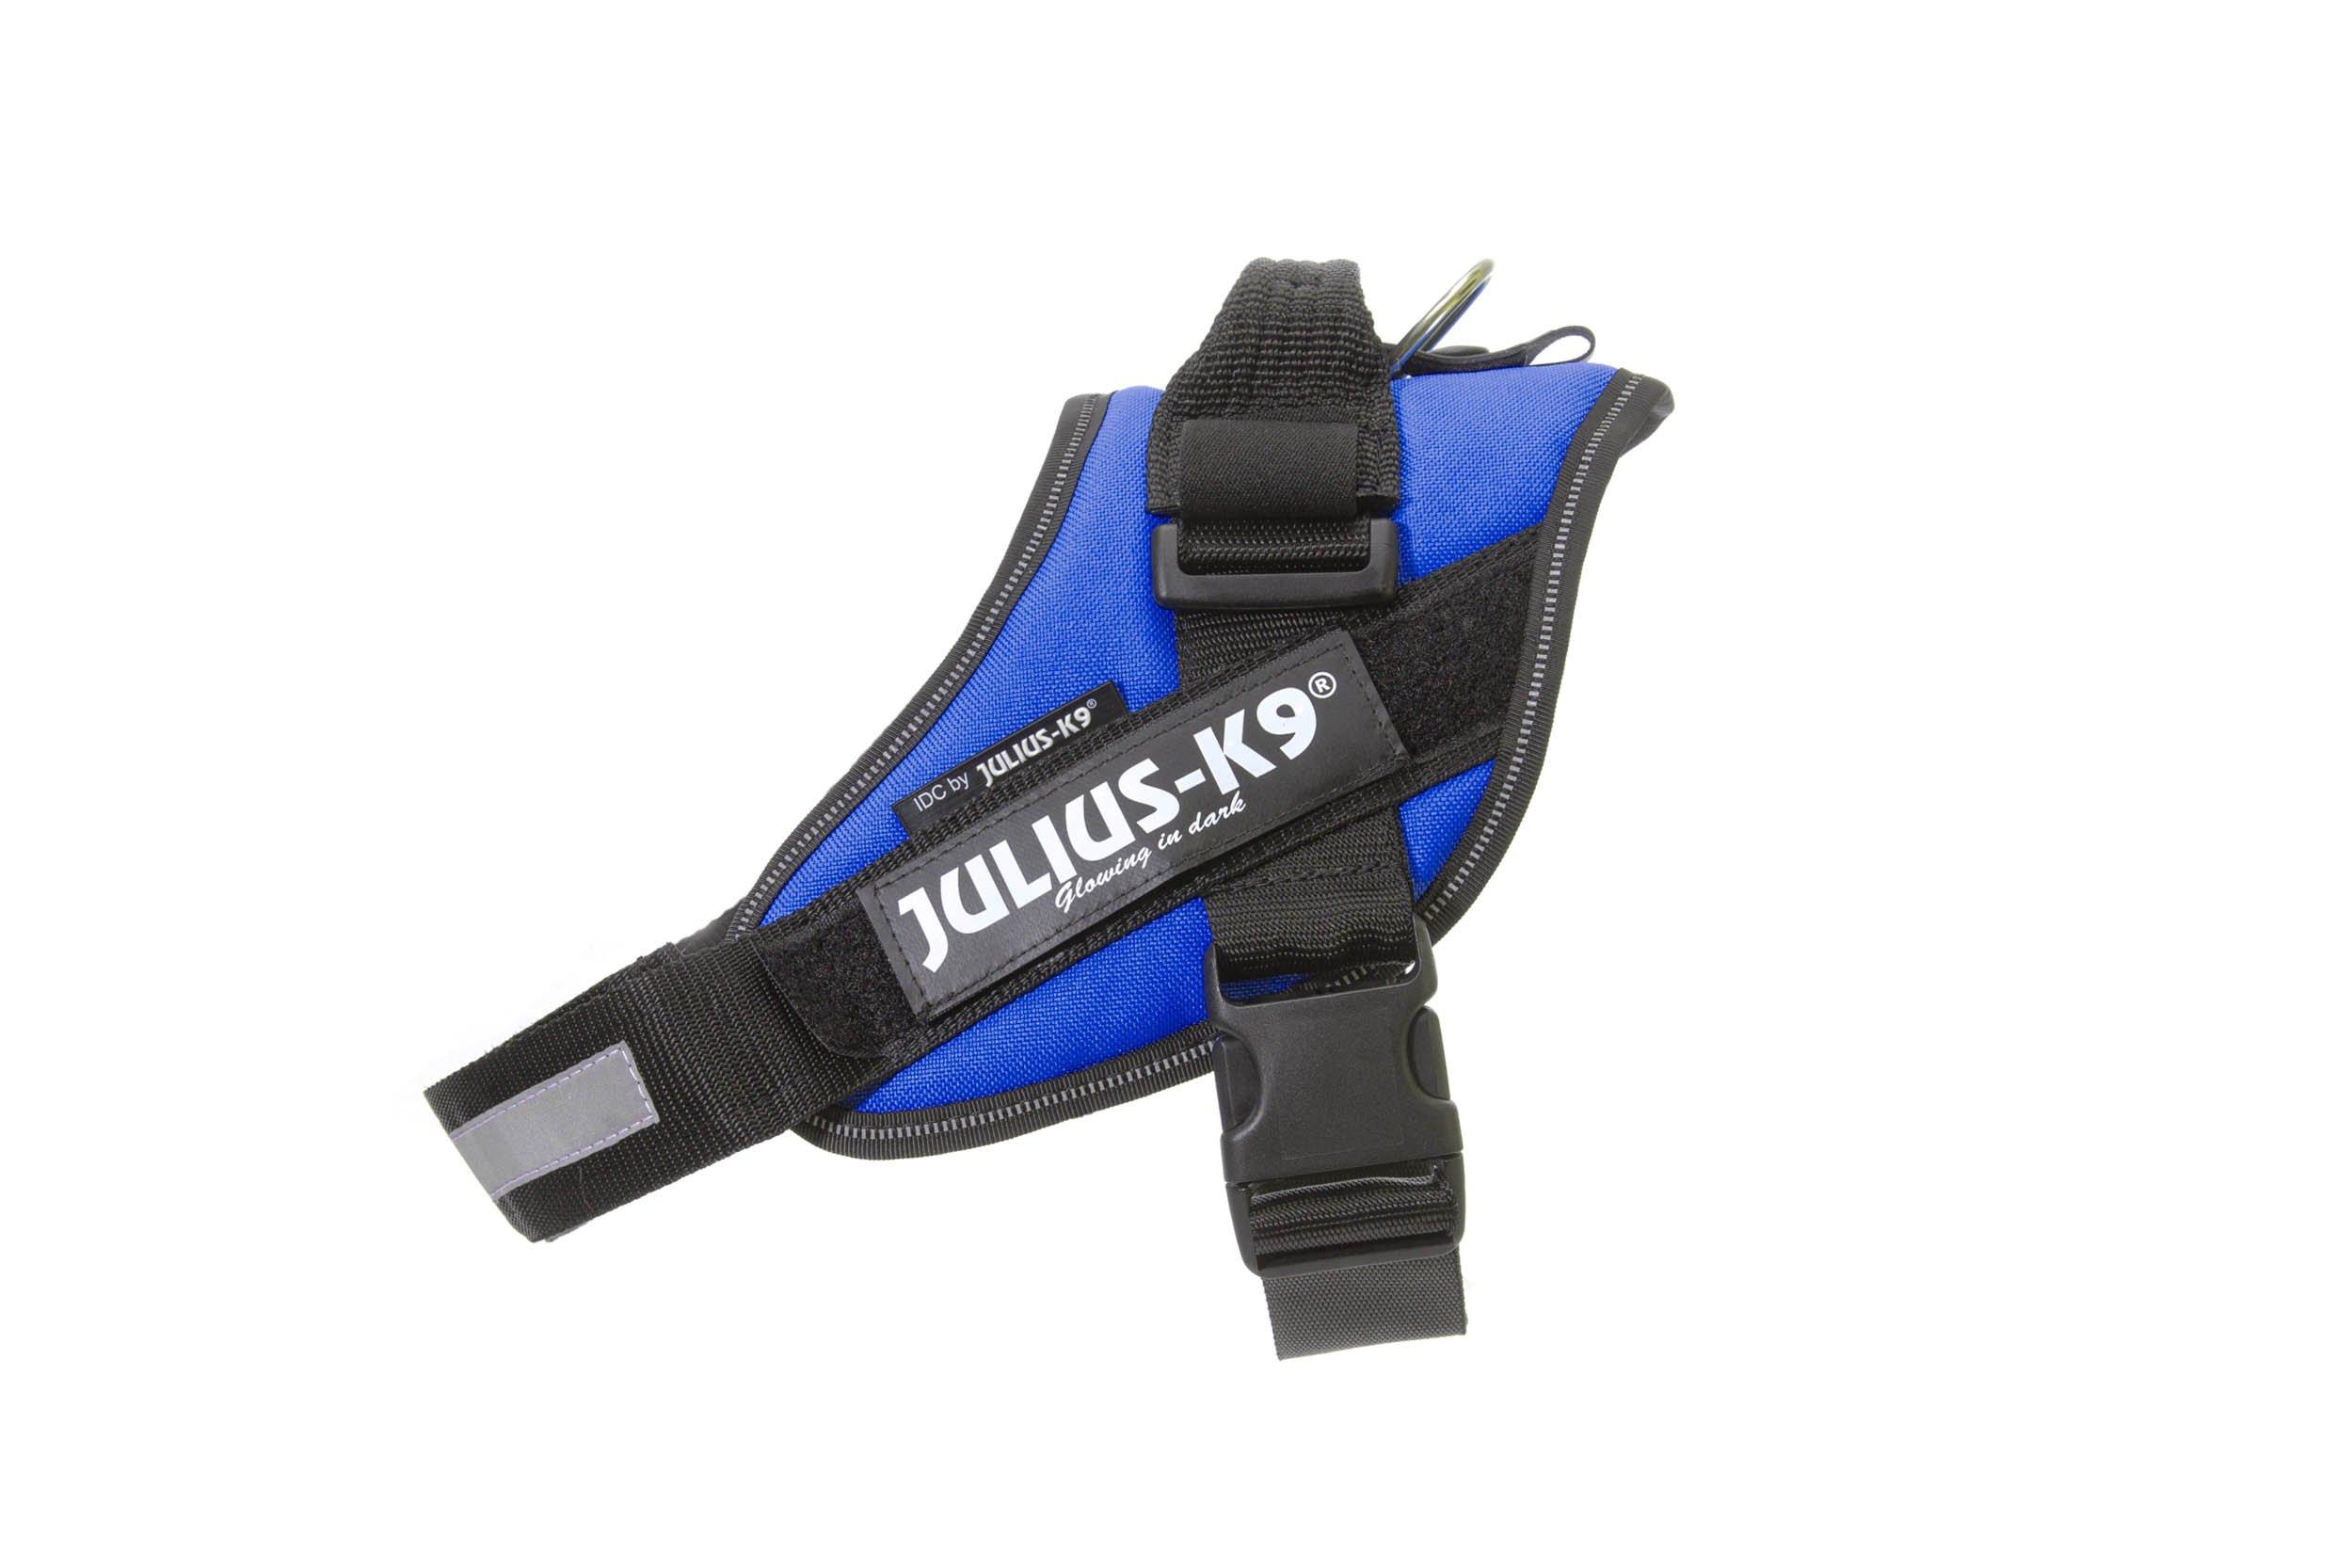 Julius-K9 16IDC-B-2 IDC Power Harness, Size: 2 (71-96cm/28-37.5''), Blue by Julius-K9 (Image #2)